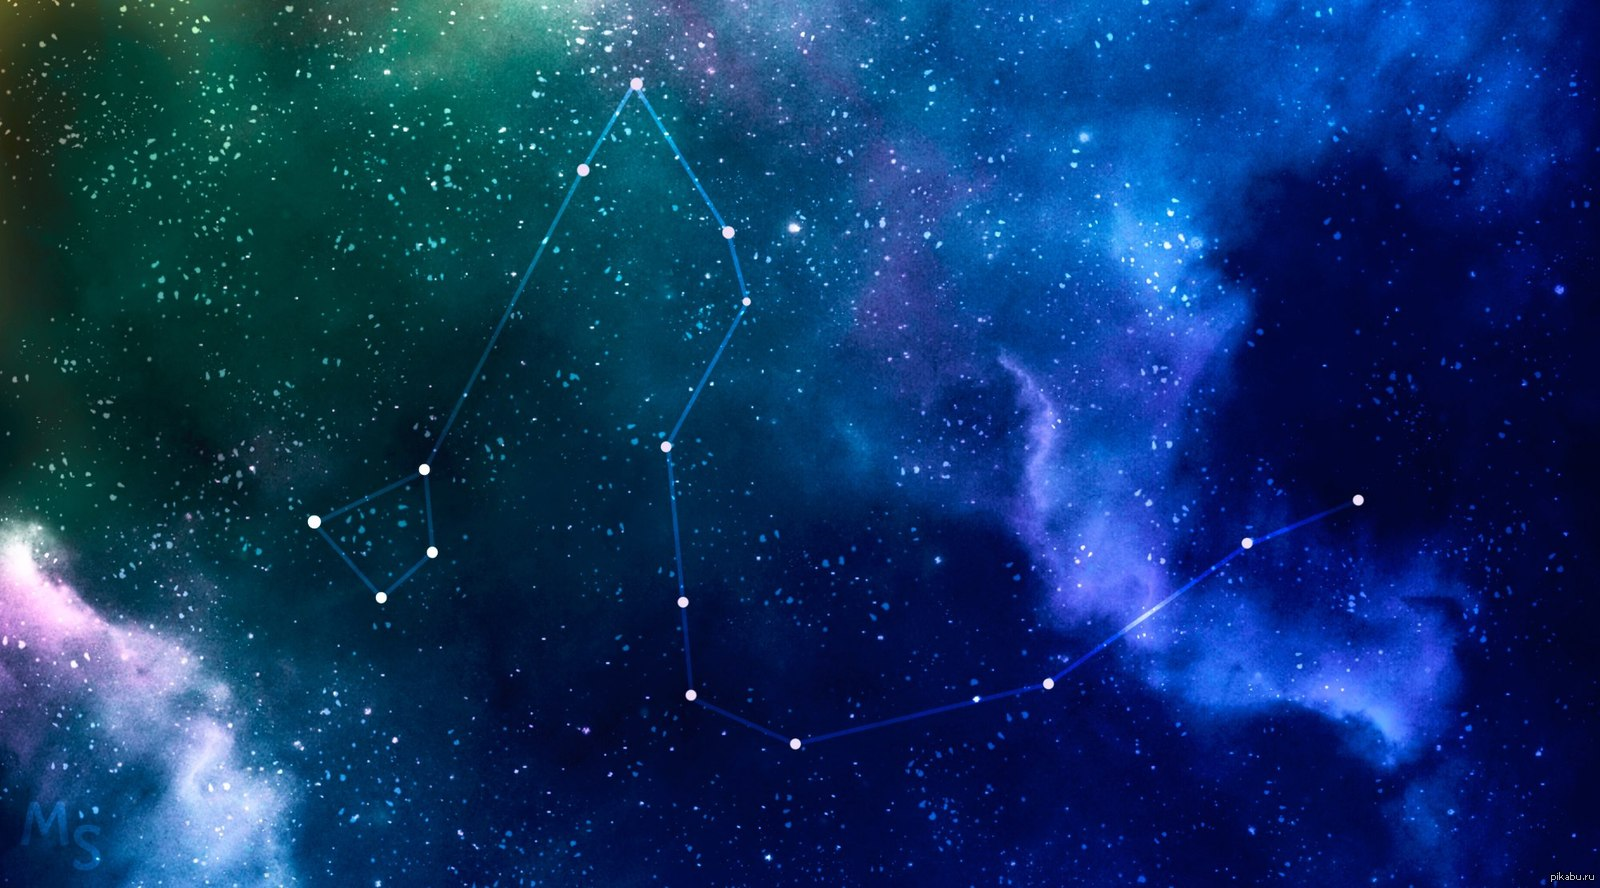 Звездное небо с созвездиями картинки